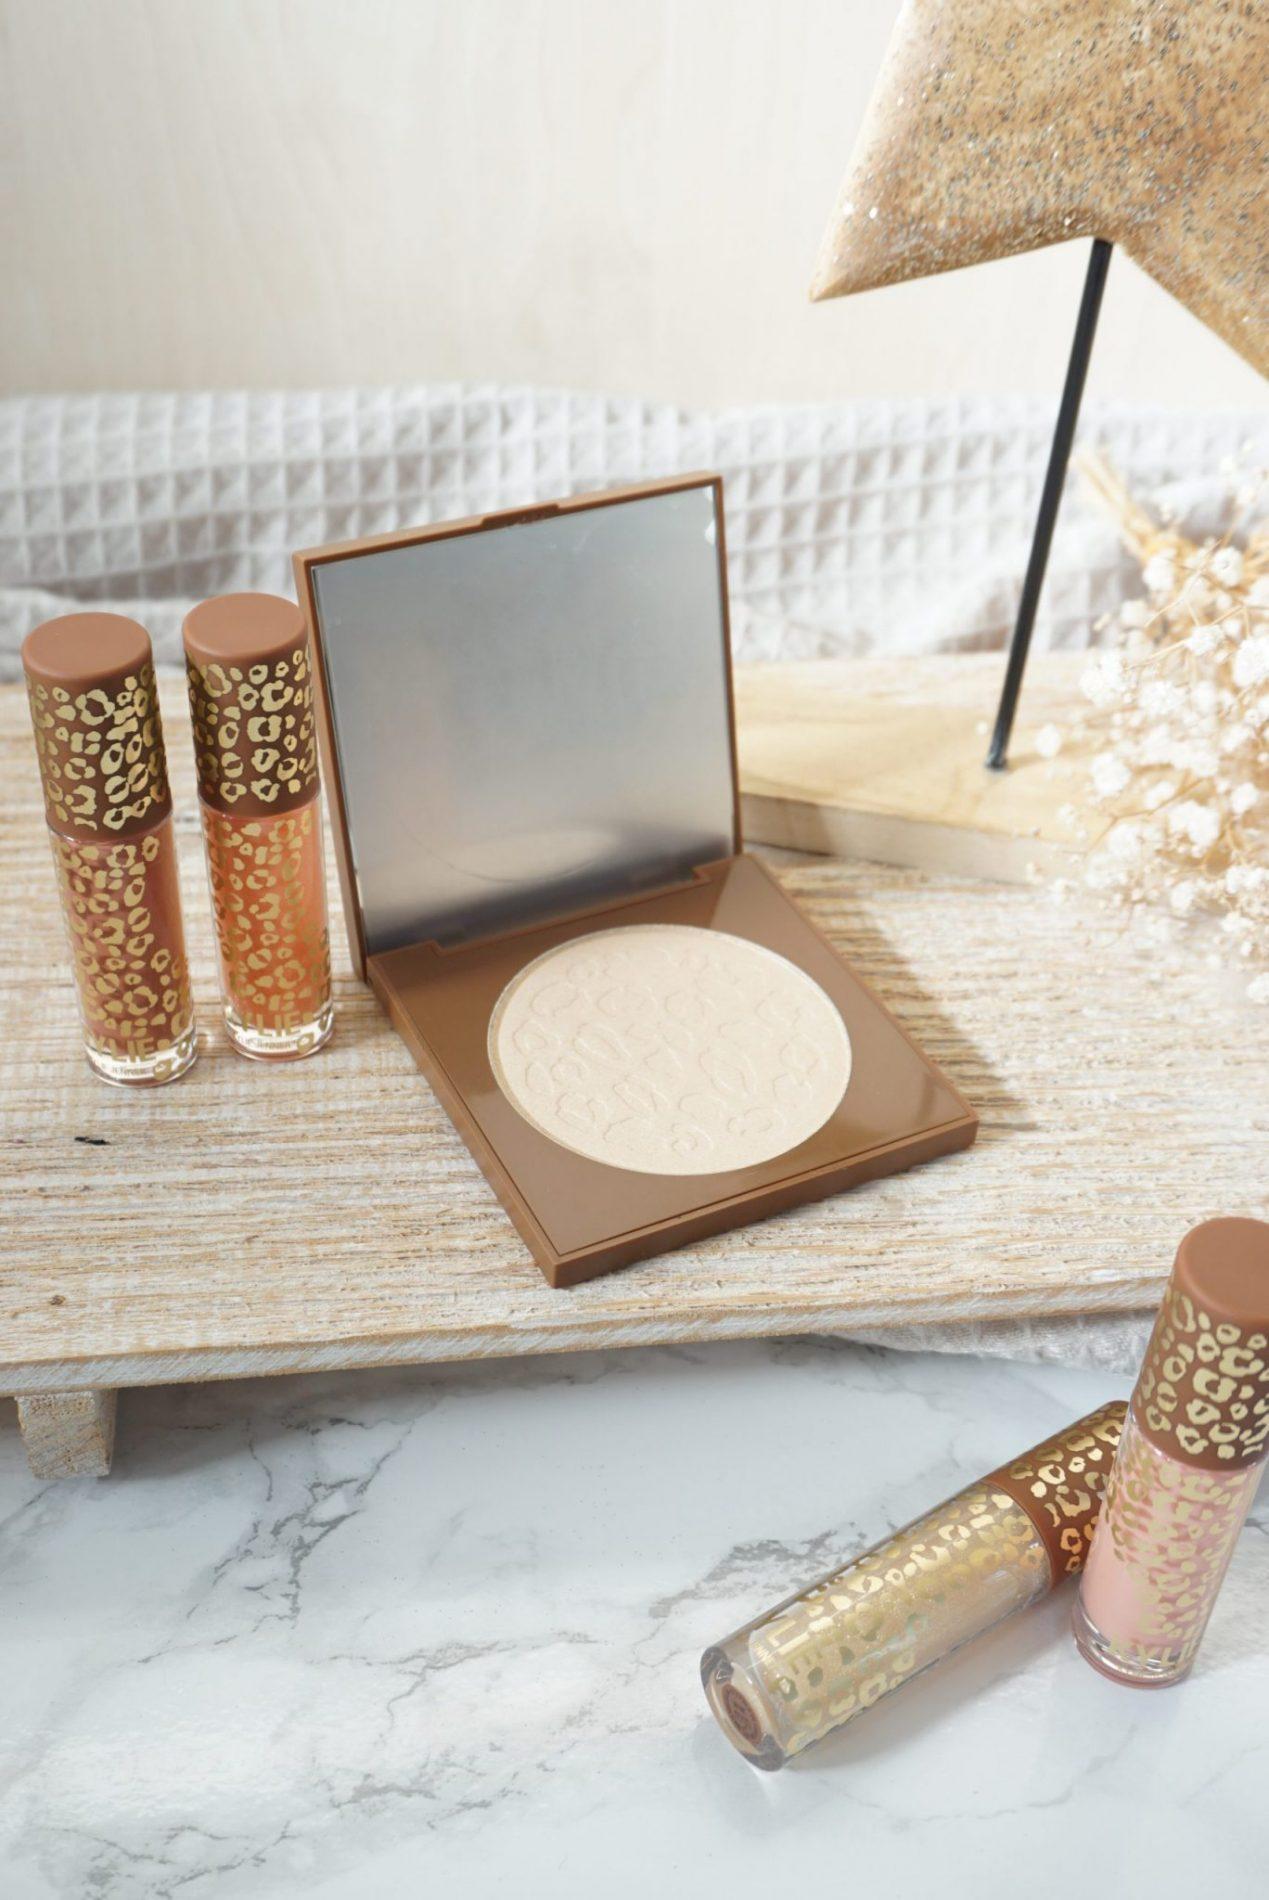 Honest Kylie Cosmetics Leopard Collection Review ⋆ Beautymone